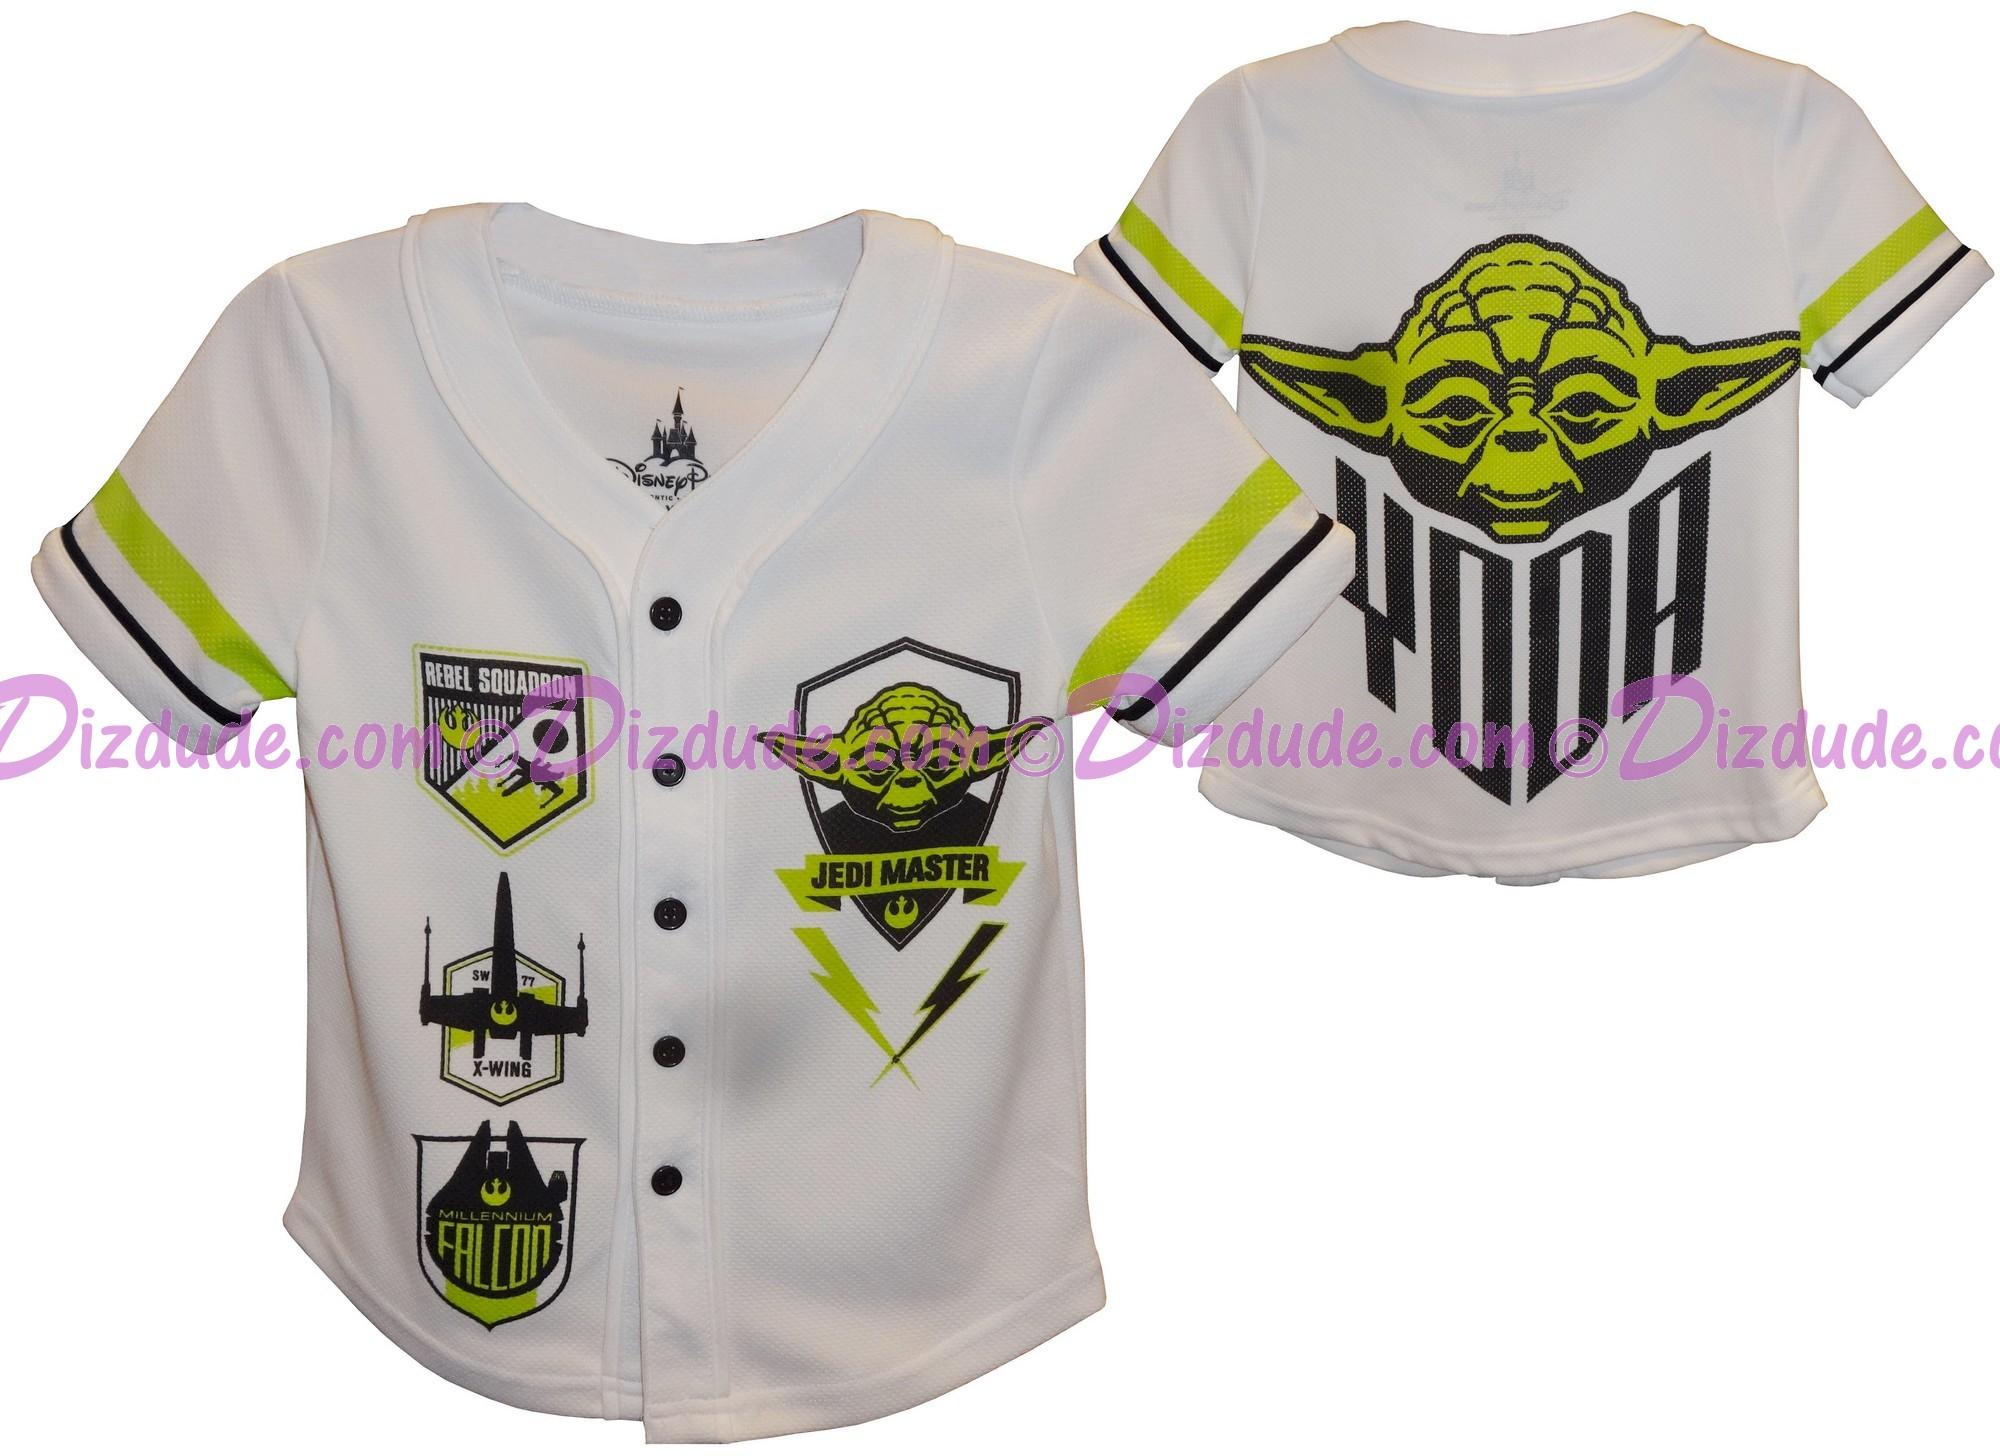 Disney Star Wars Yoda Mesh Youth Shirt (T-Shirt, Tshirt, T shirt or Tee) © Dizdude.com